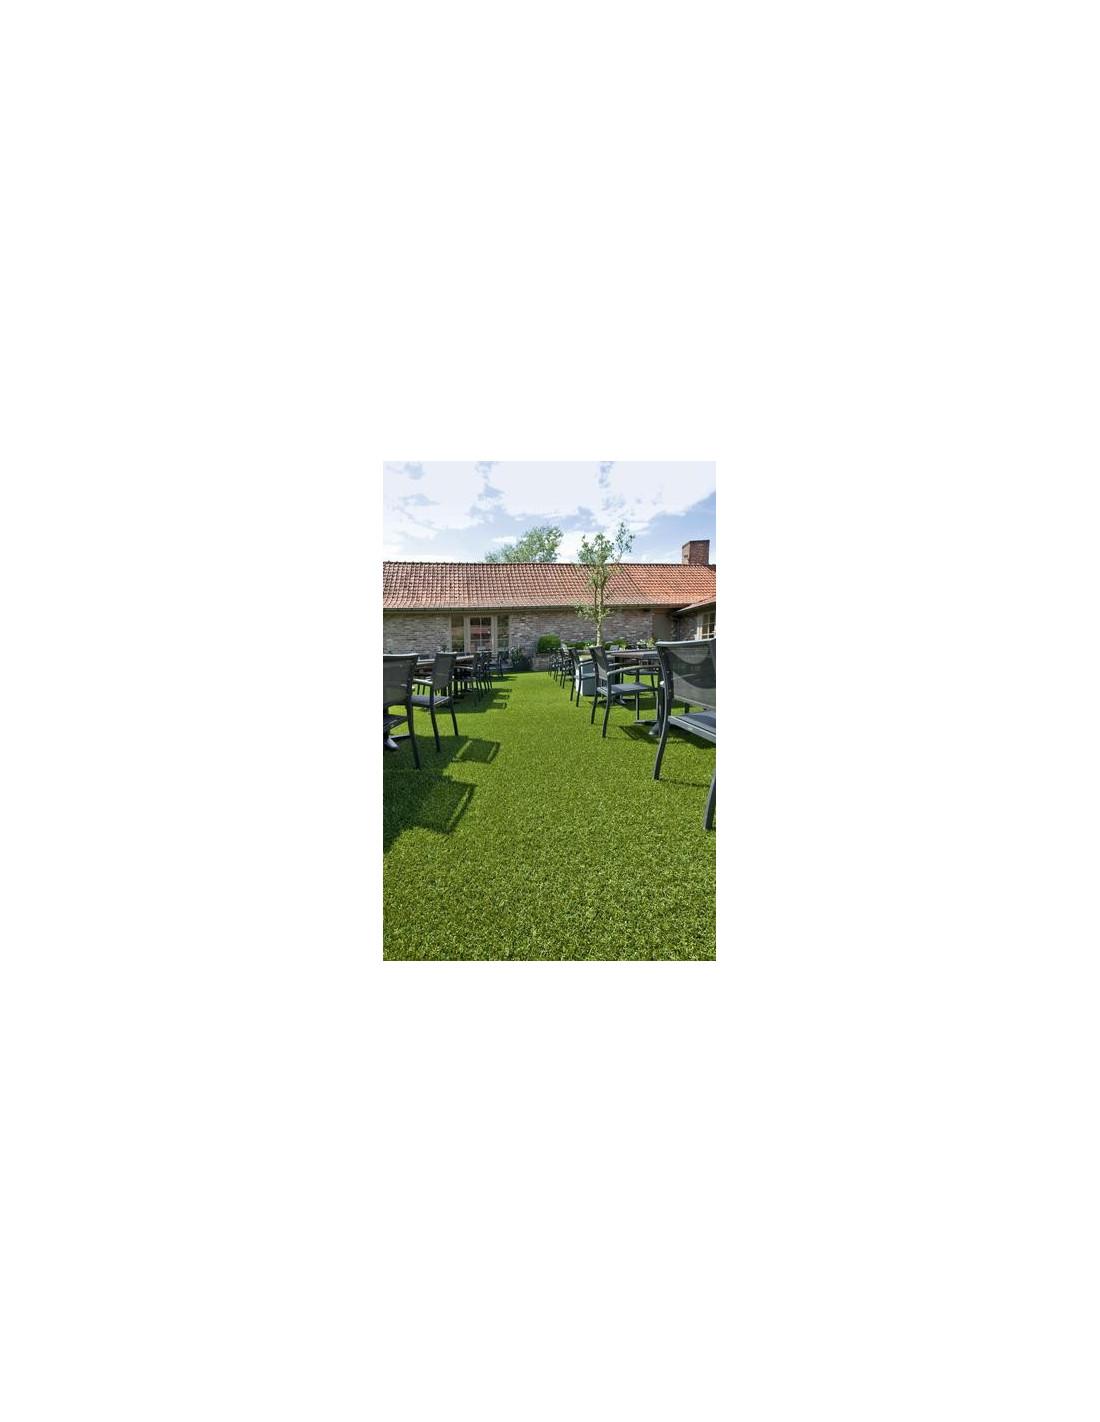 beaulieu moquette gazon artificiel evergreen 7000 groen 4m hyper brico. Black Bedroom Furniture Sets. Home Design Ideas